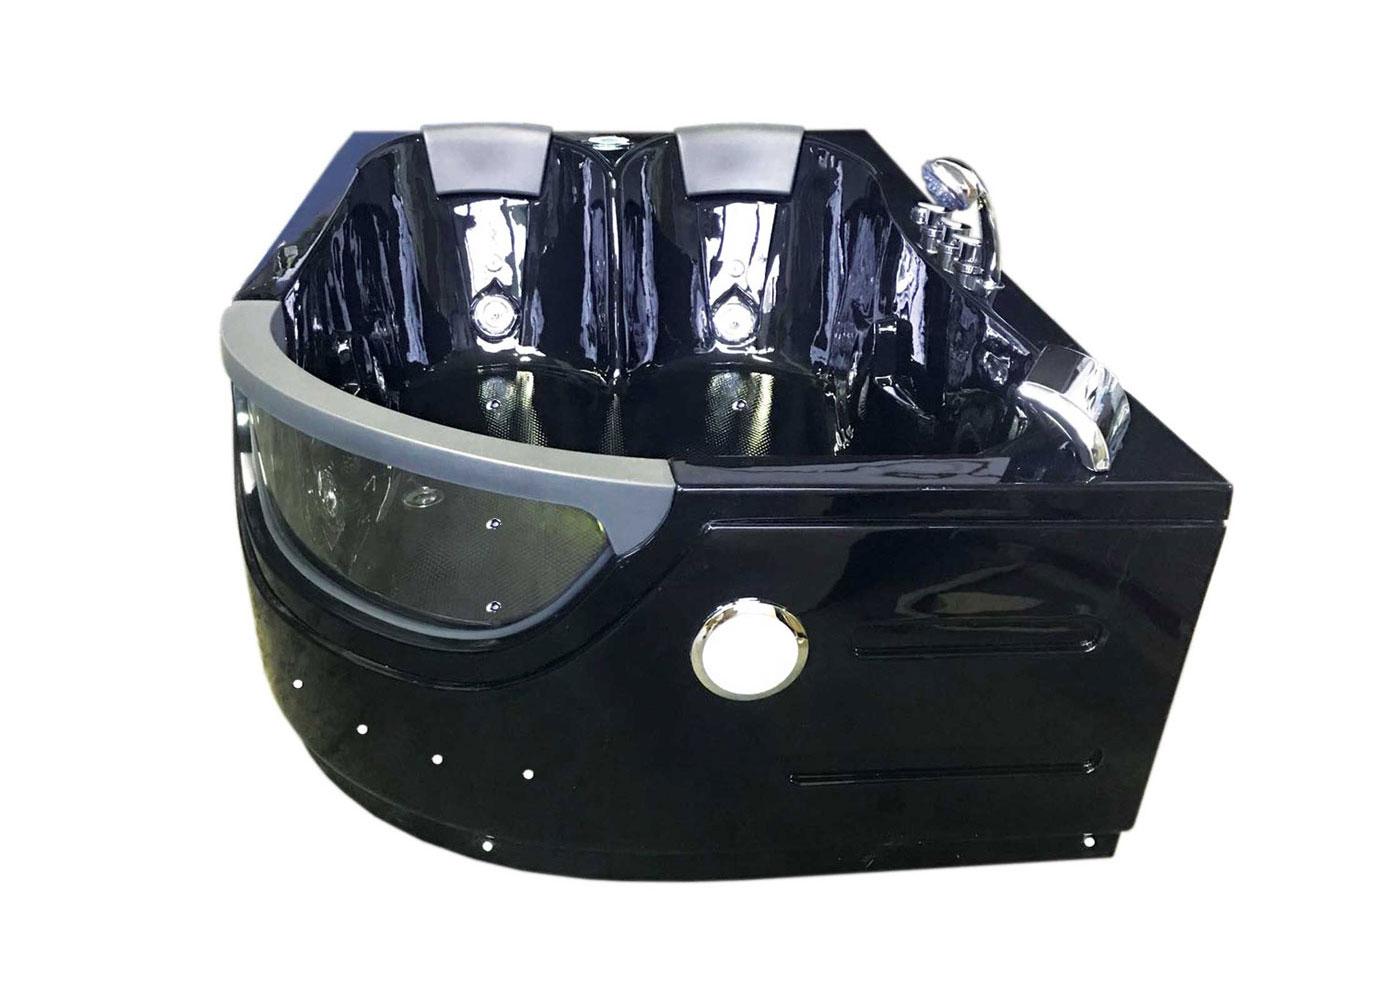 Whirlpool Bathtub Black 71 6 X 48 Hot Tub Double Pump Orion